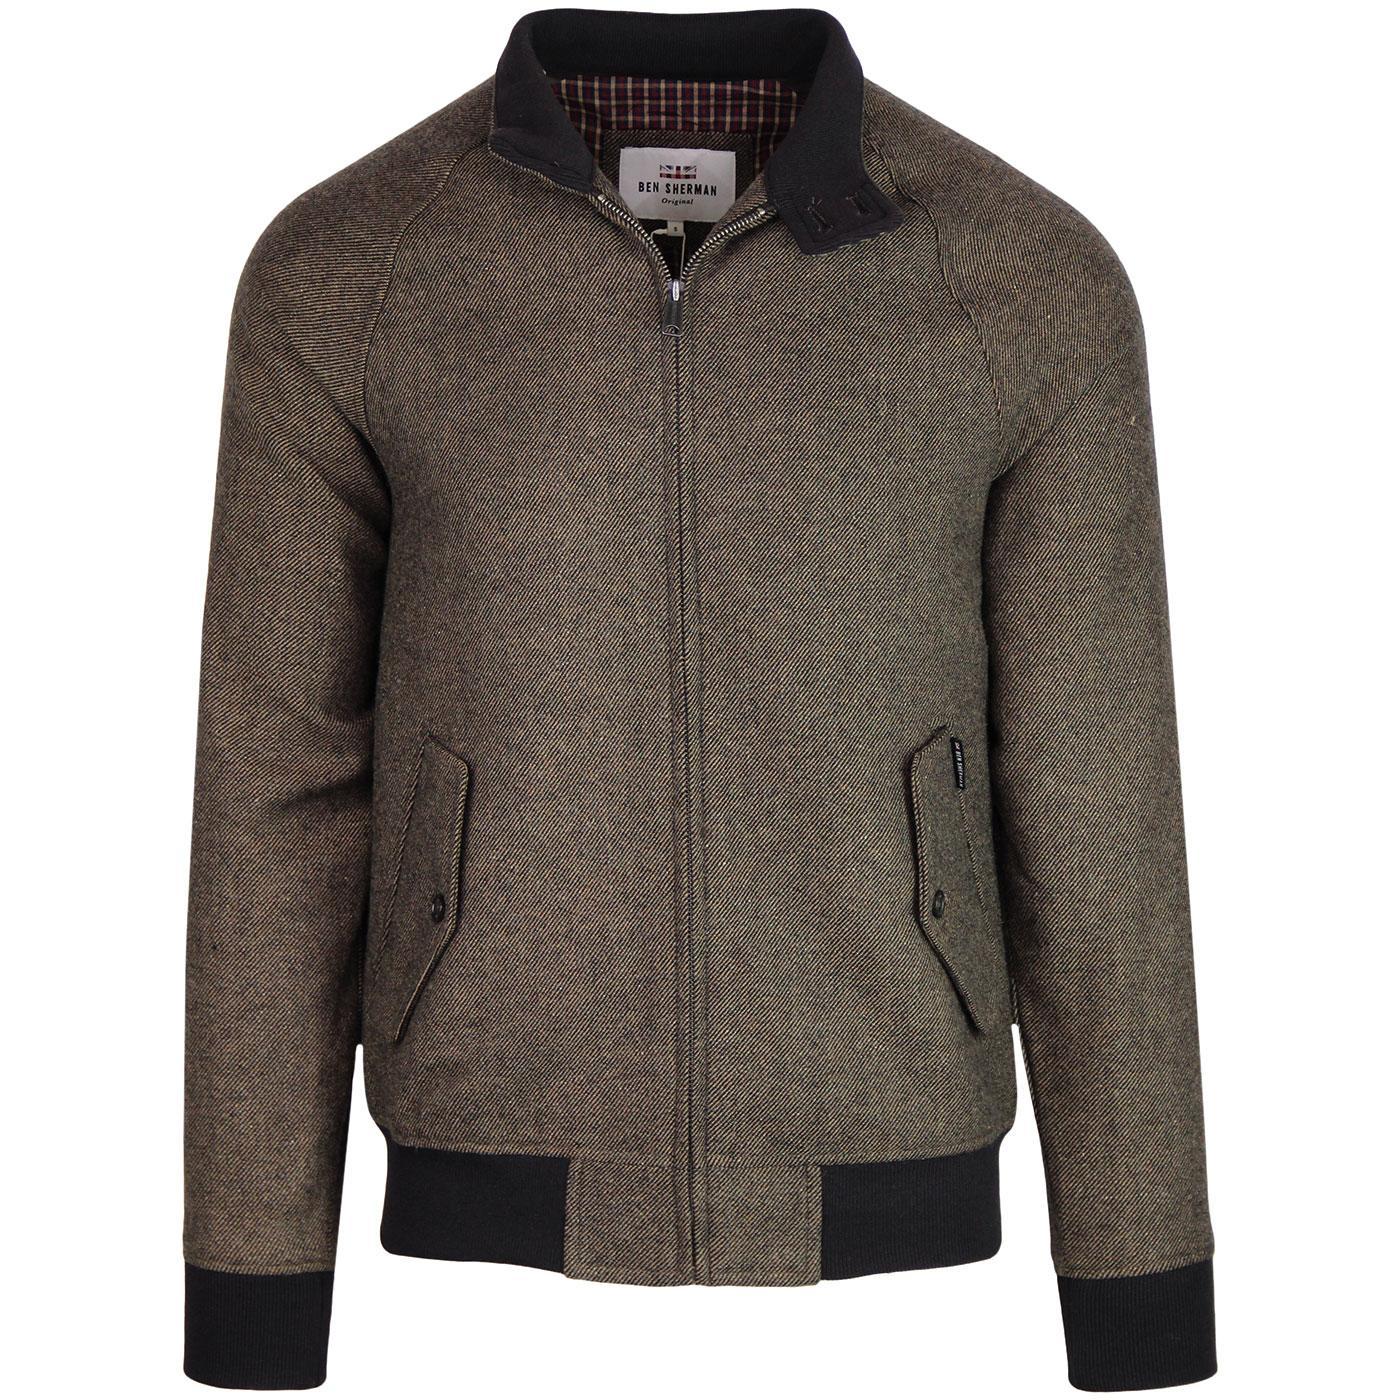 BEN SHERMAN Men's Mod Wool Harrington Jacket BARK